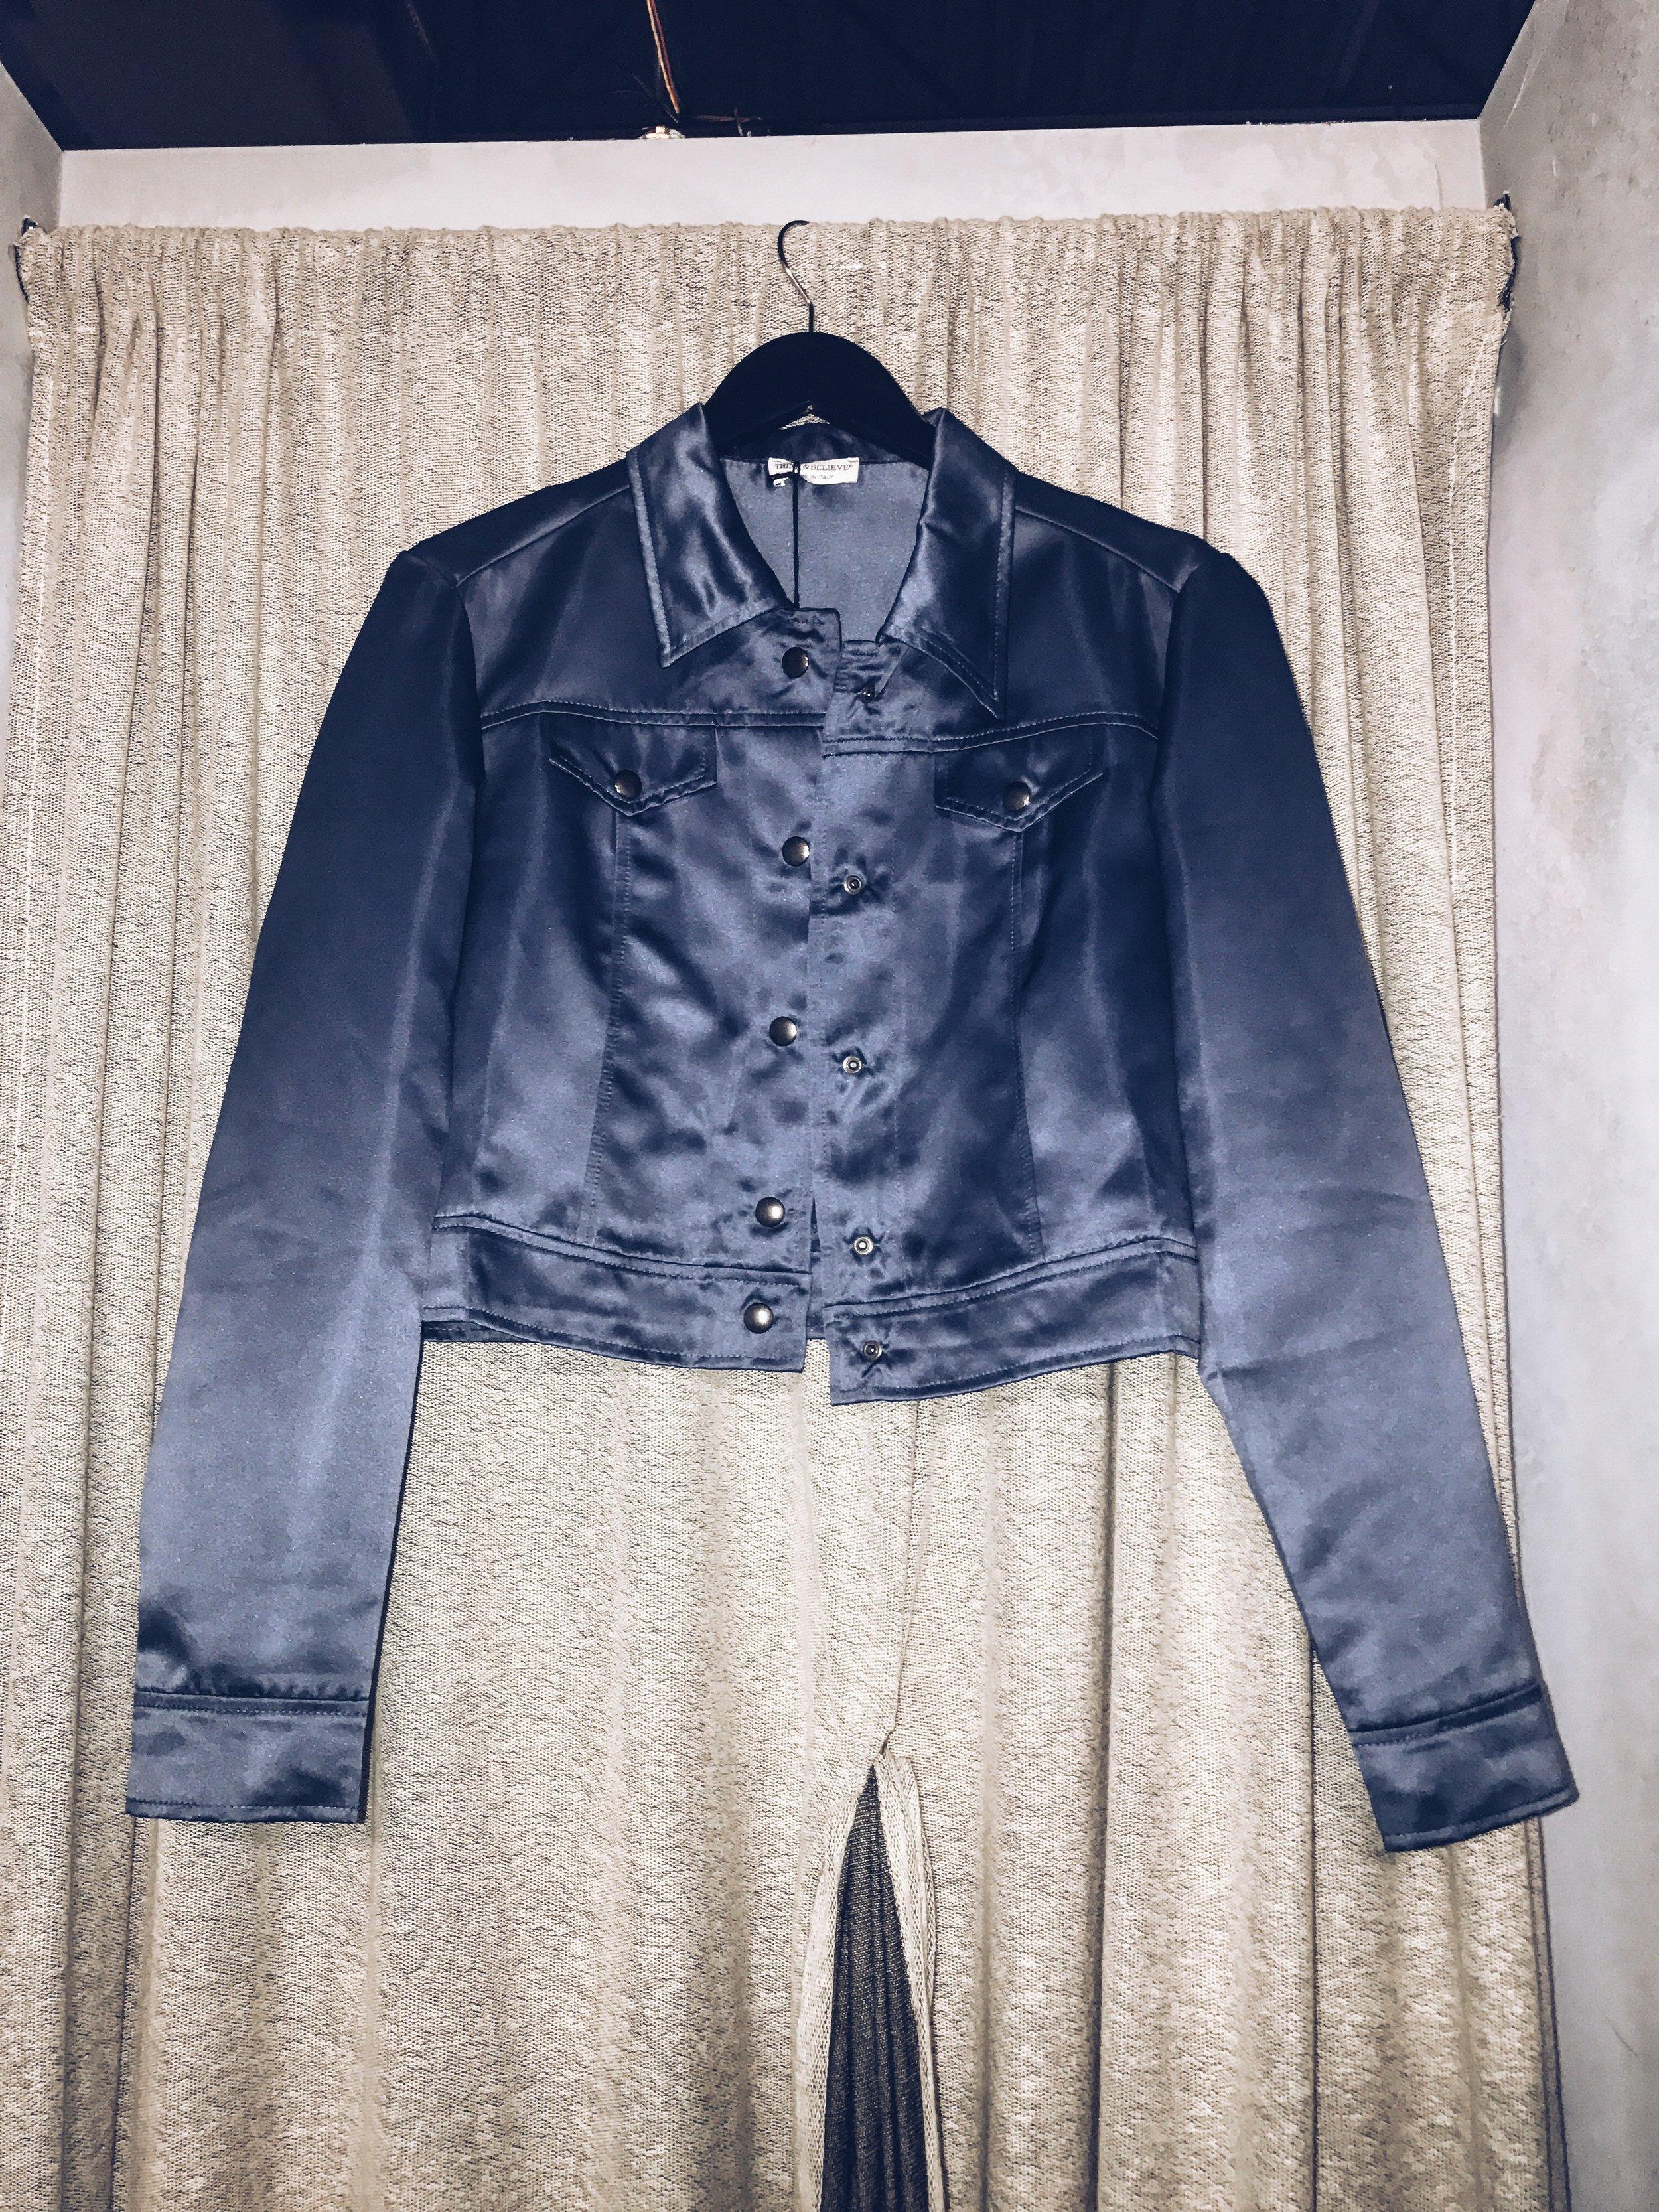 miami-fashion-stylist-portfolio-blogger-illy-perez-house-of-she4.JPG